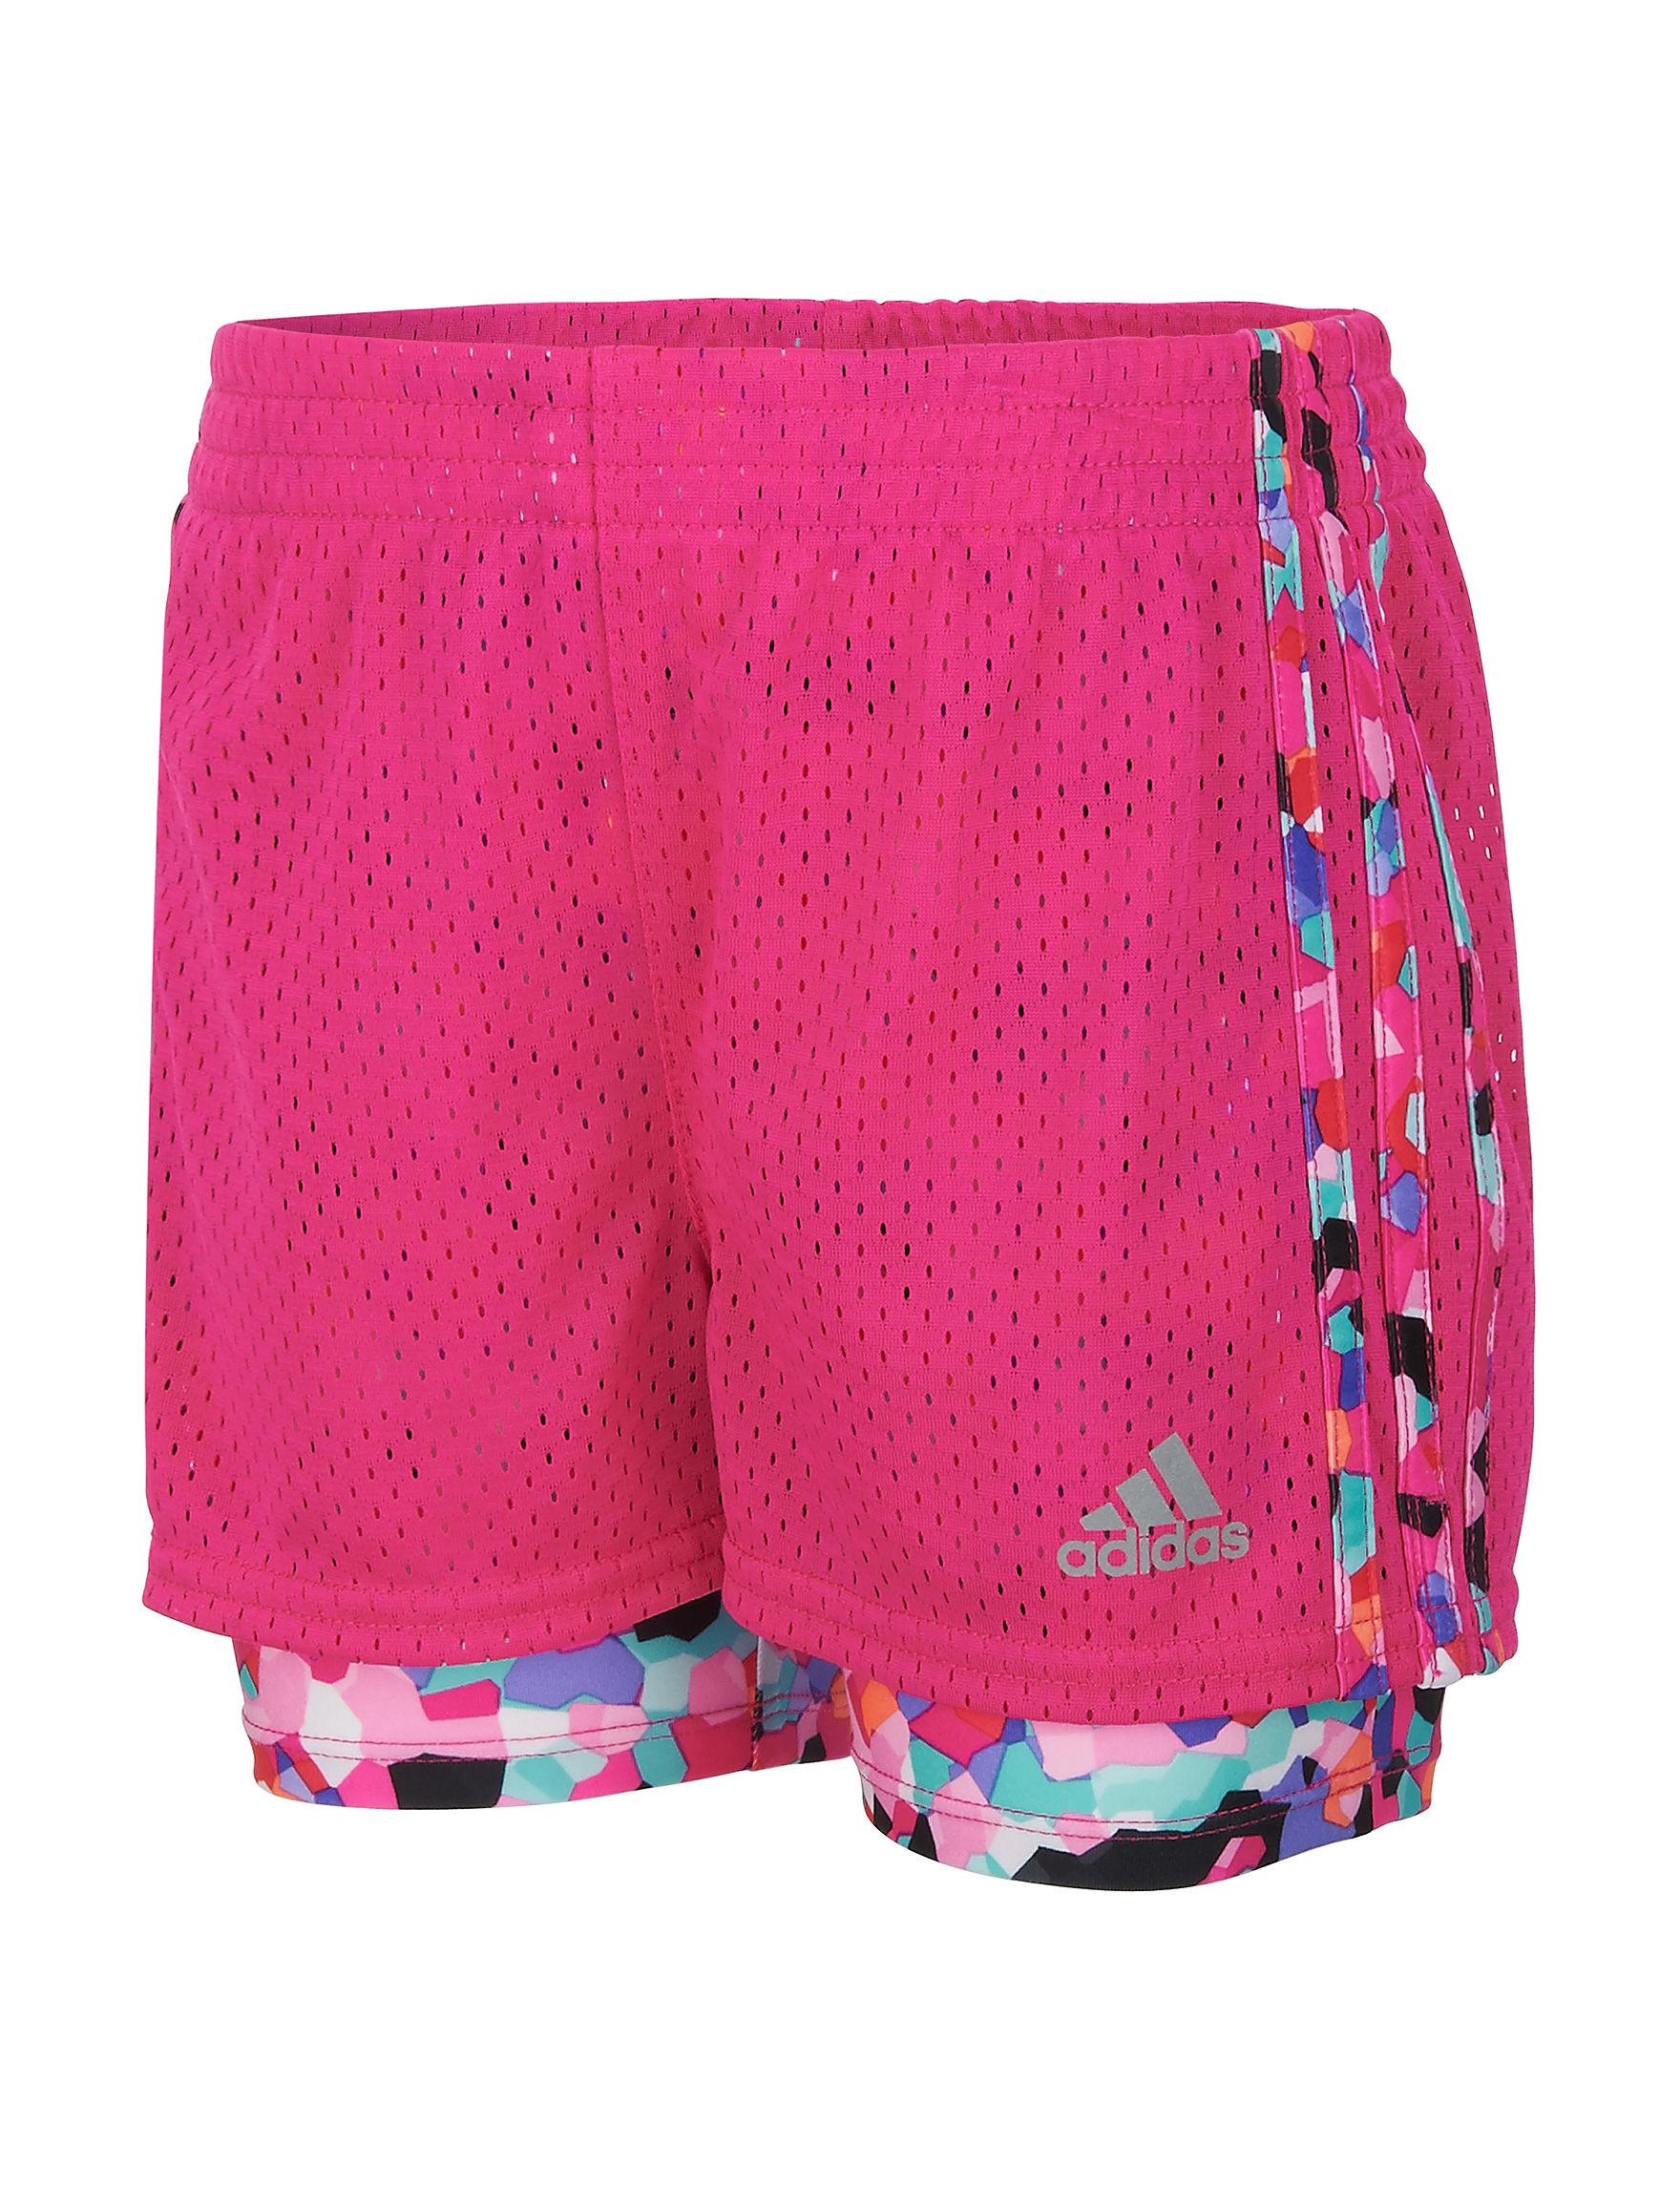 Adidas Medium Pink Loose